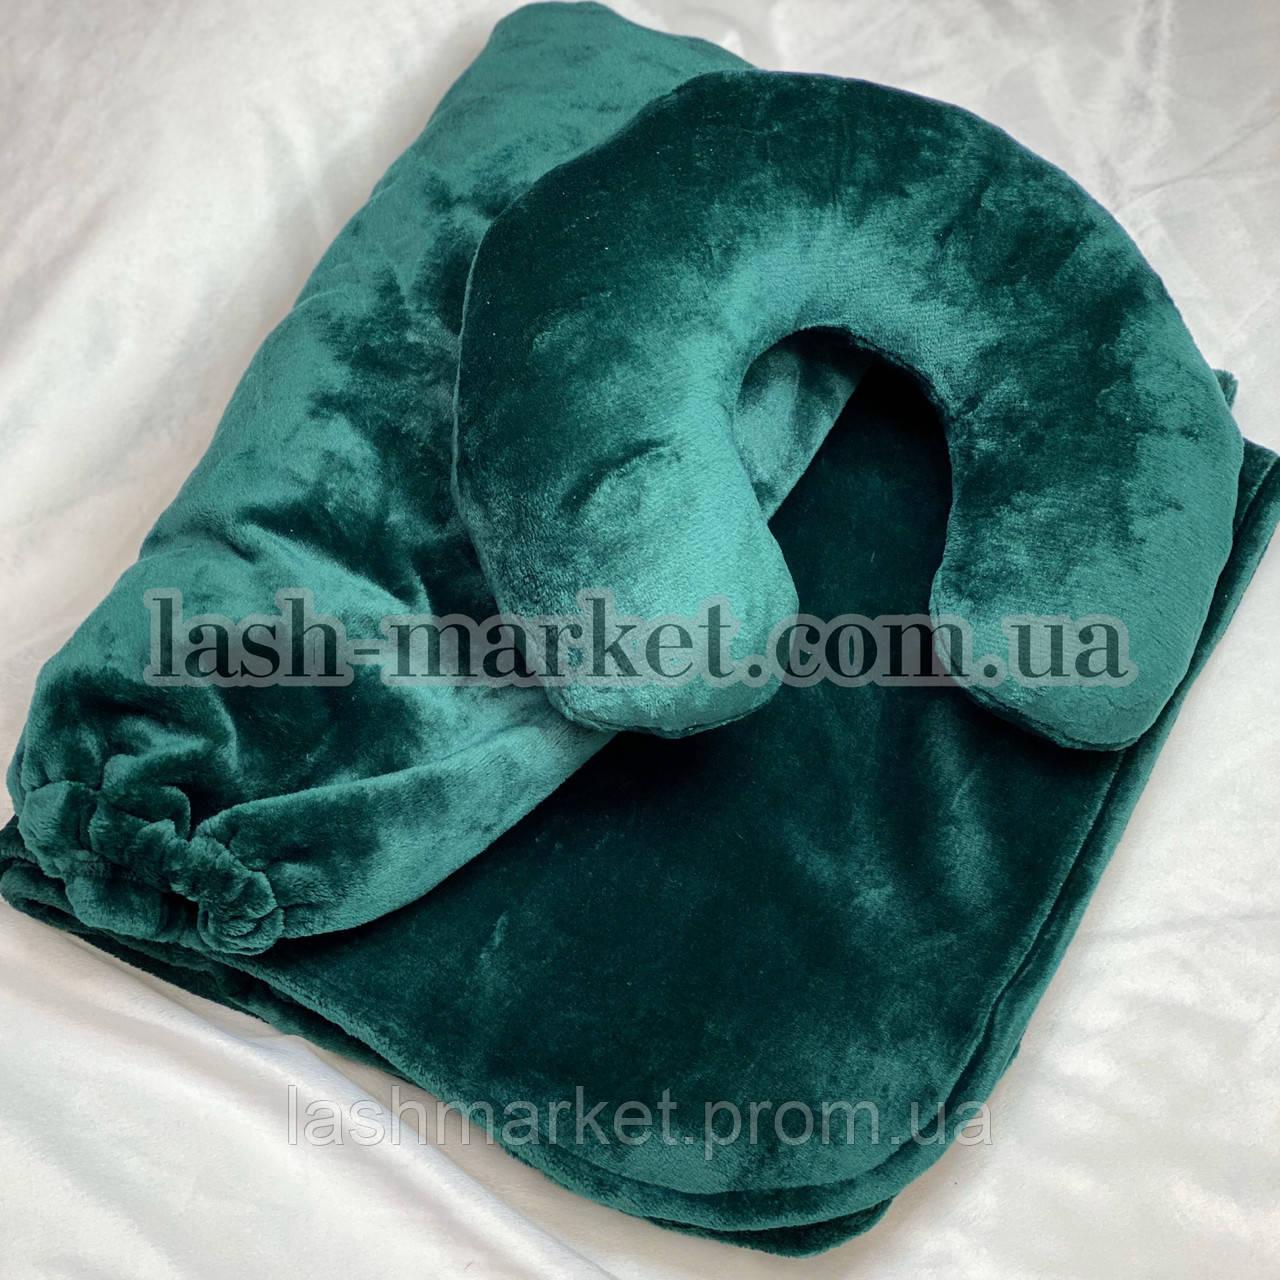 Набор 3в1: чехол на кушетку, плед, подушка ИЗУМРУД